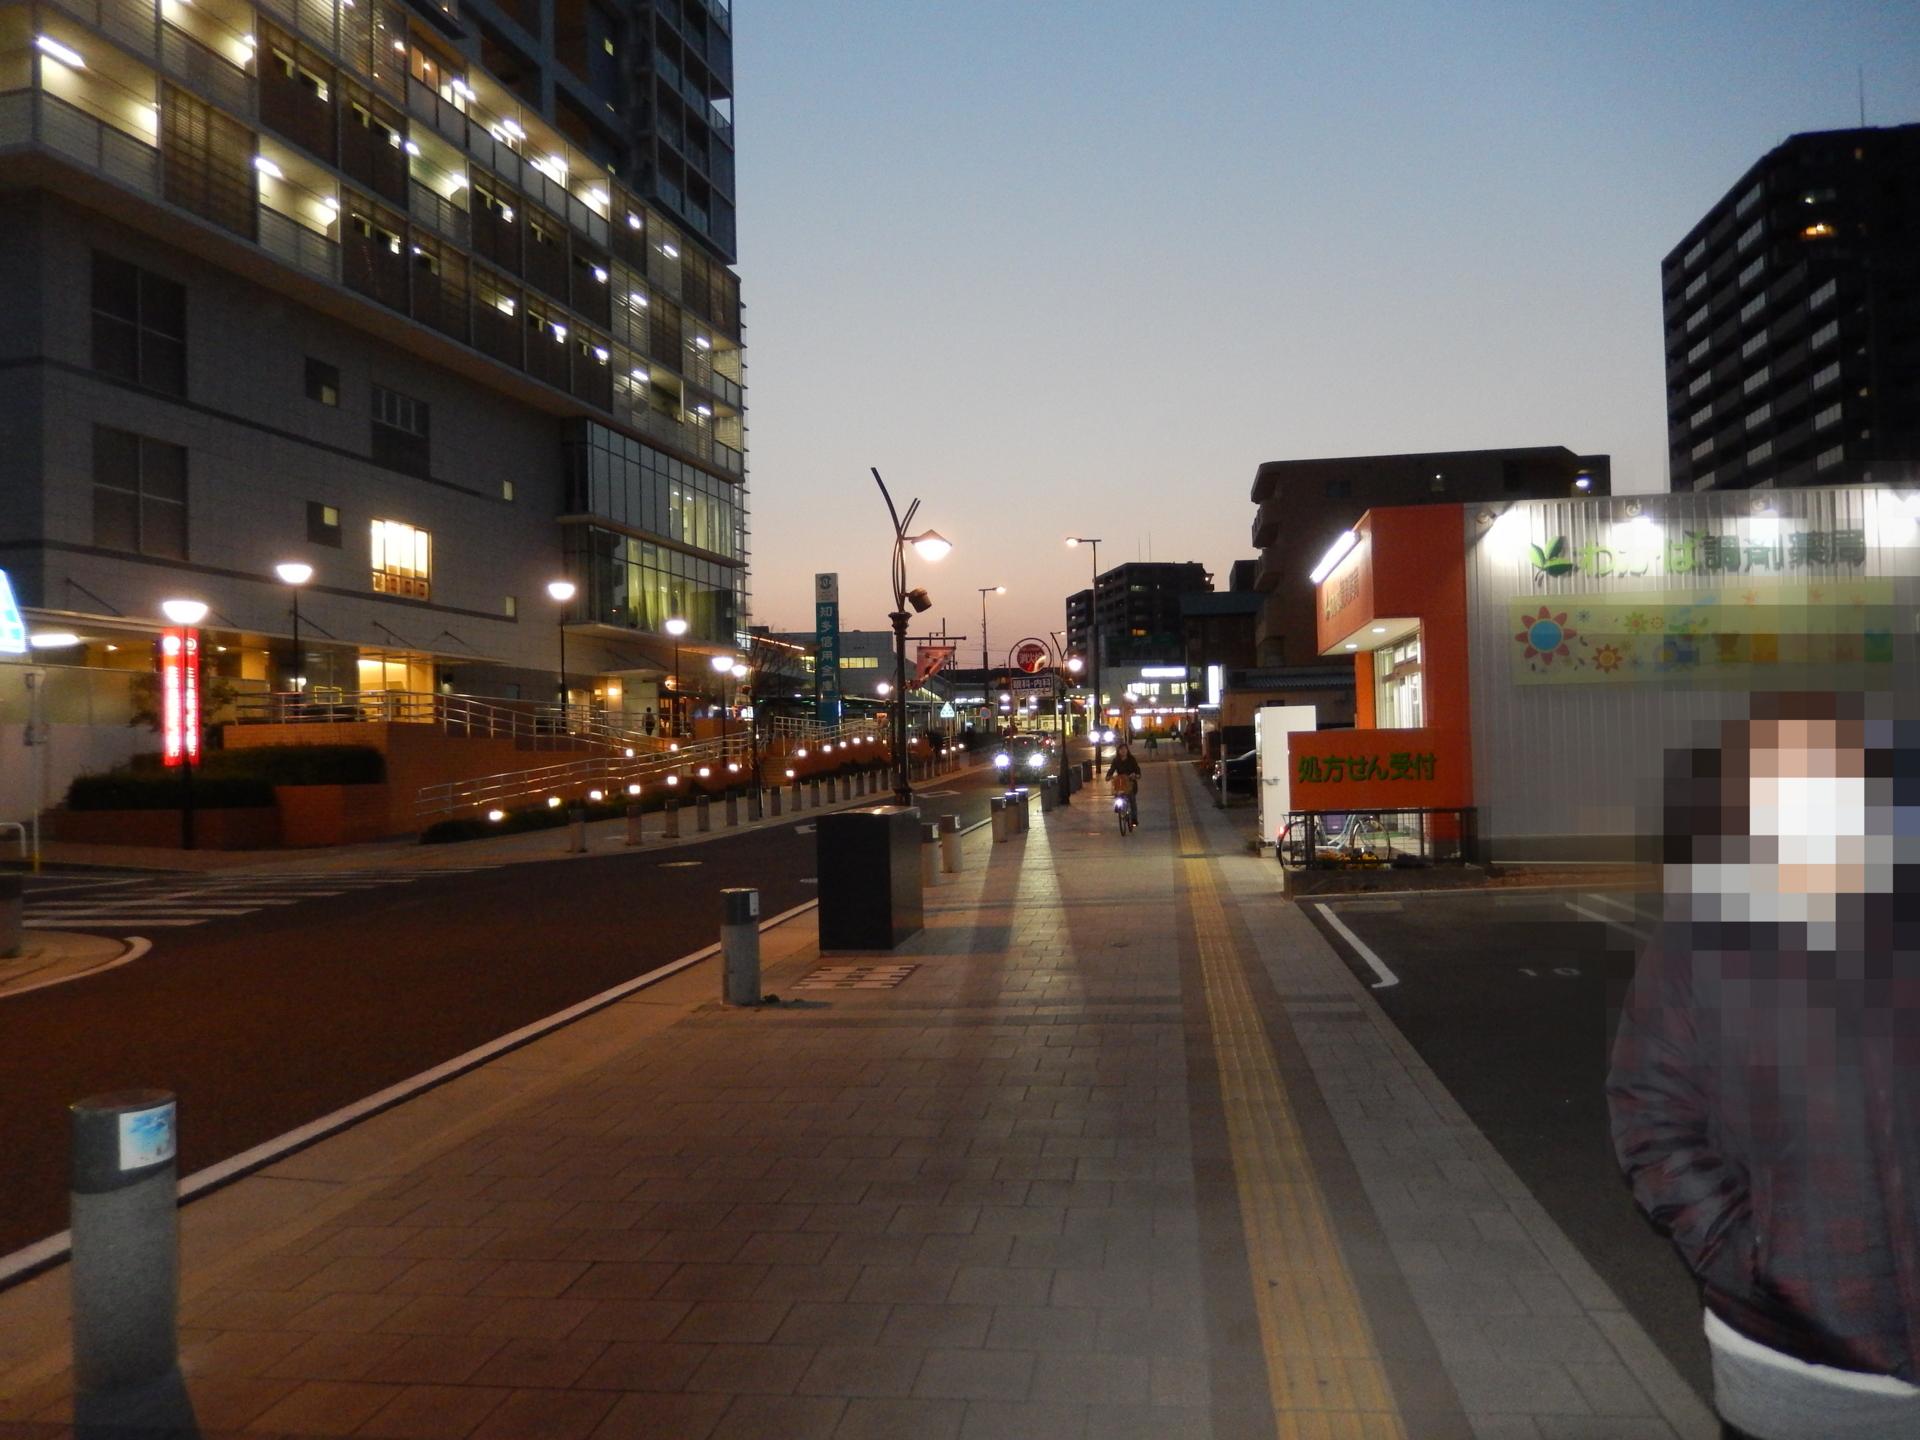 f:id:ToshUeno:20140411183904j:plain